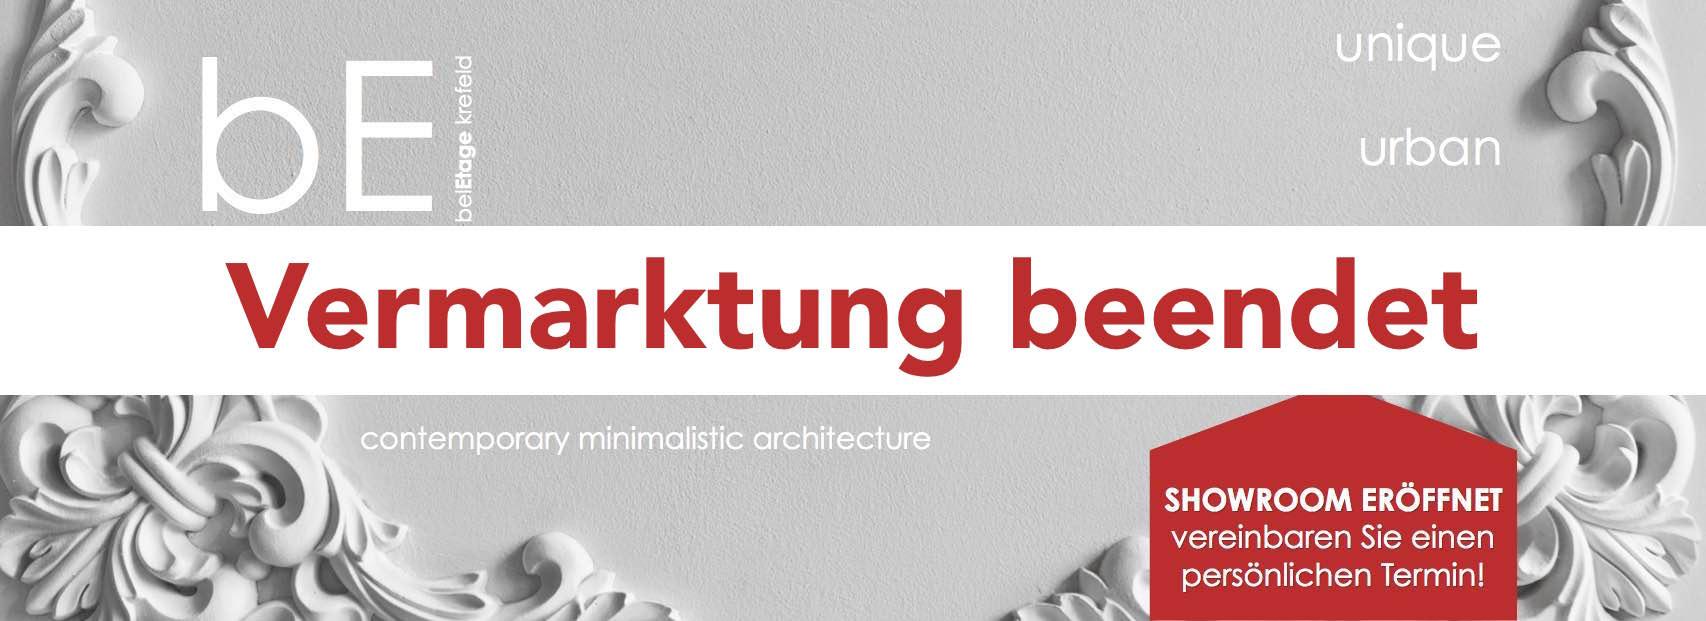 Immobilienmakler Düsseldorf: belEtage Krefeld Luxuslofts im Baudenkmal